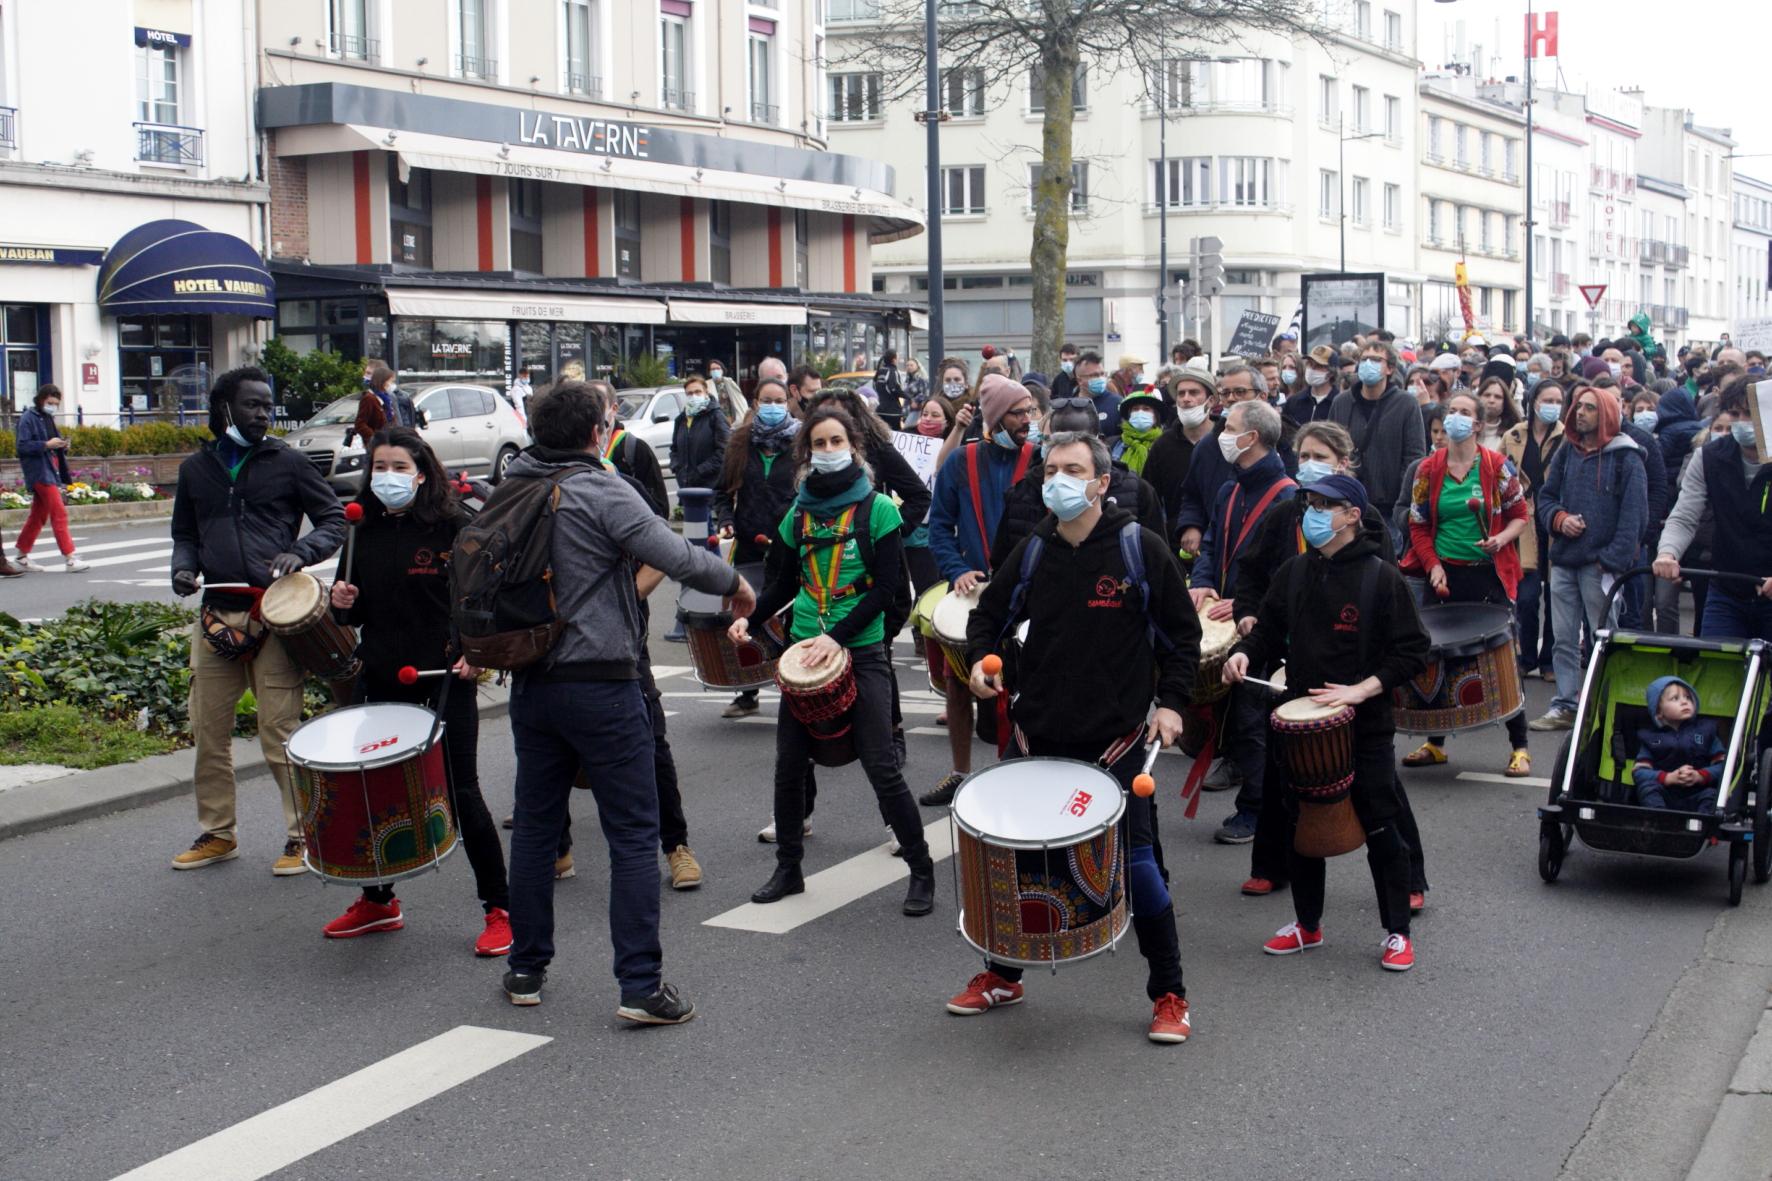 Manif-culture-Brest-20-03-21-115